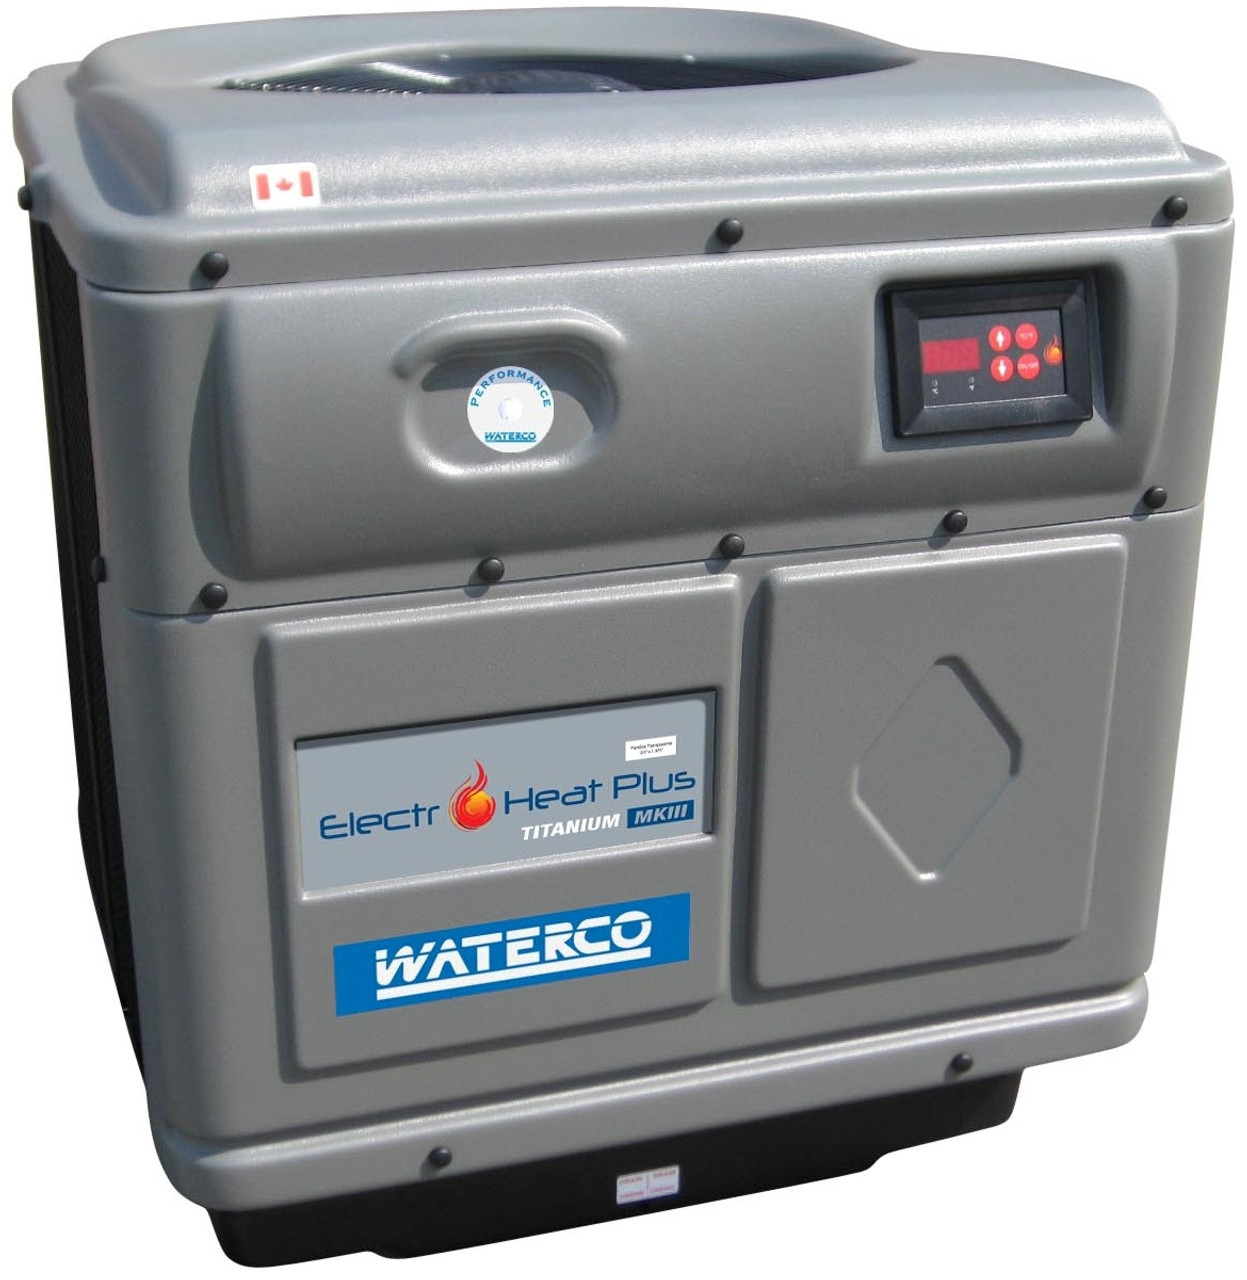 Waterco Electro Heat Plus Swimming Pool Heat Pump